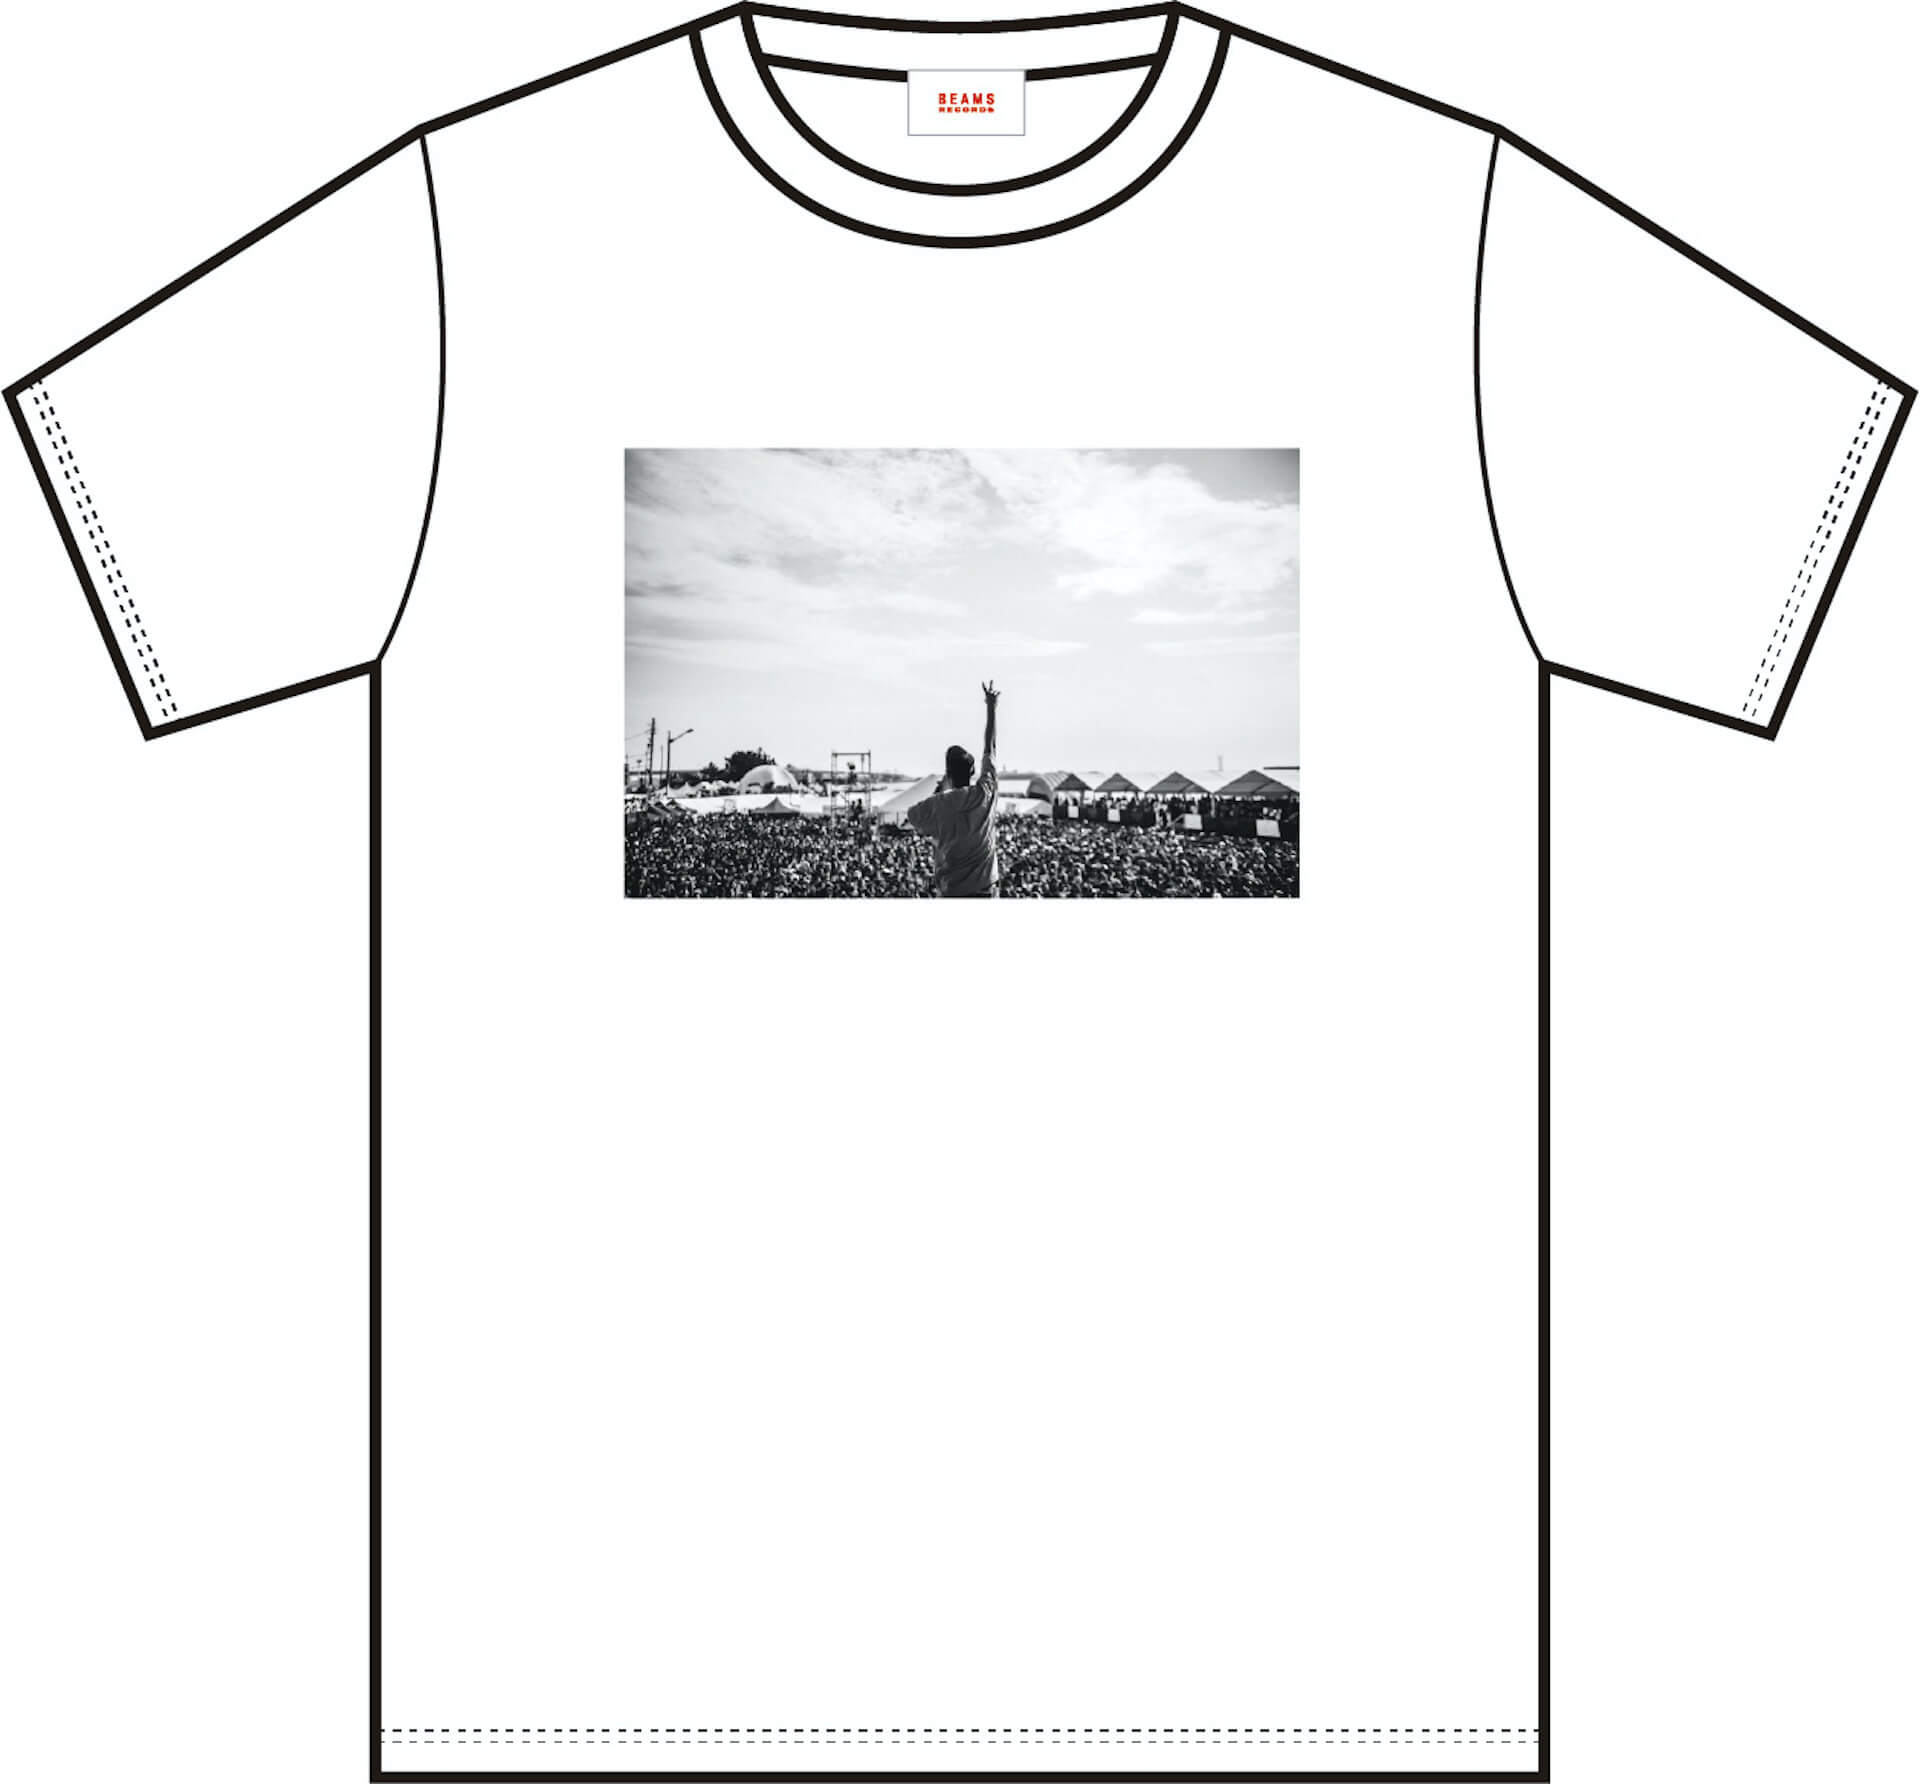 J-WAVE × BEAMS RECORDSのTシャツ第2弾が受注販売開始!本秀康、cherry chill will、TOWA TEIらが参加 music200612_jwave_beamsrecords_02